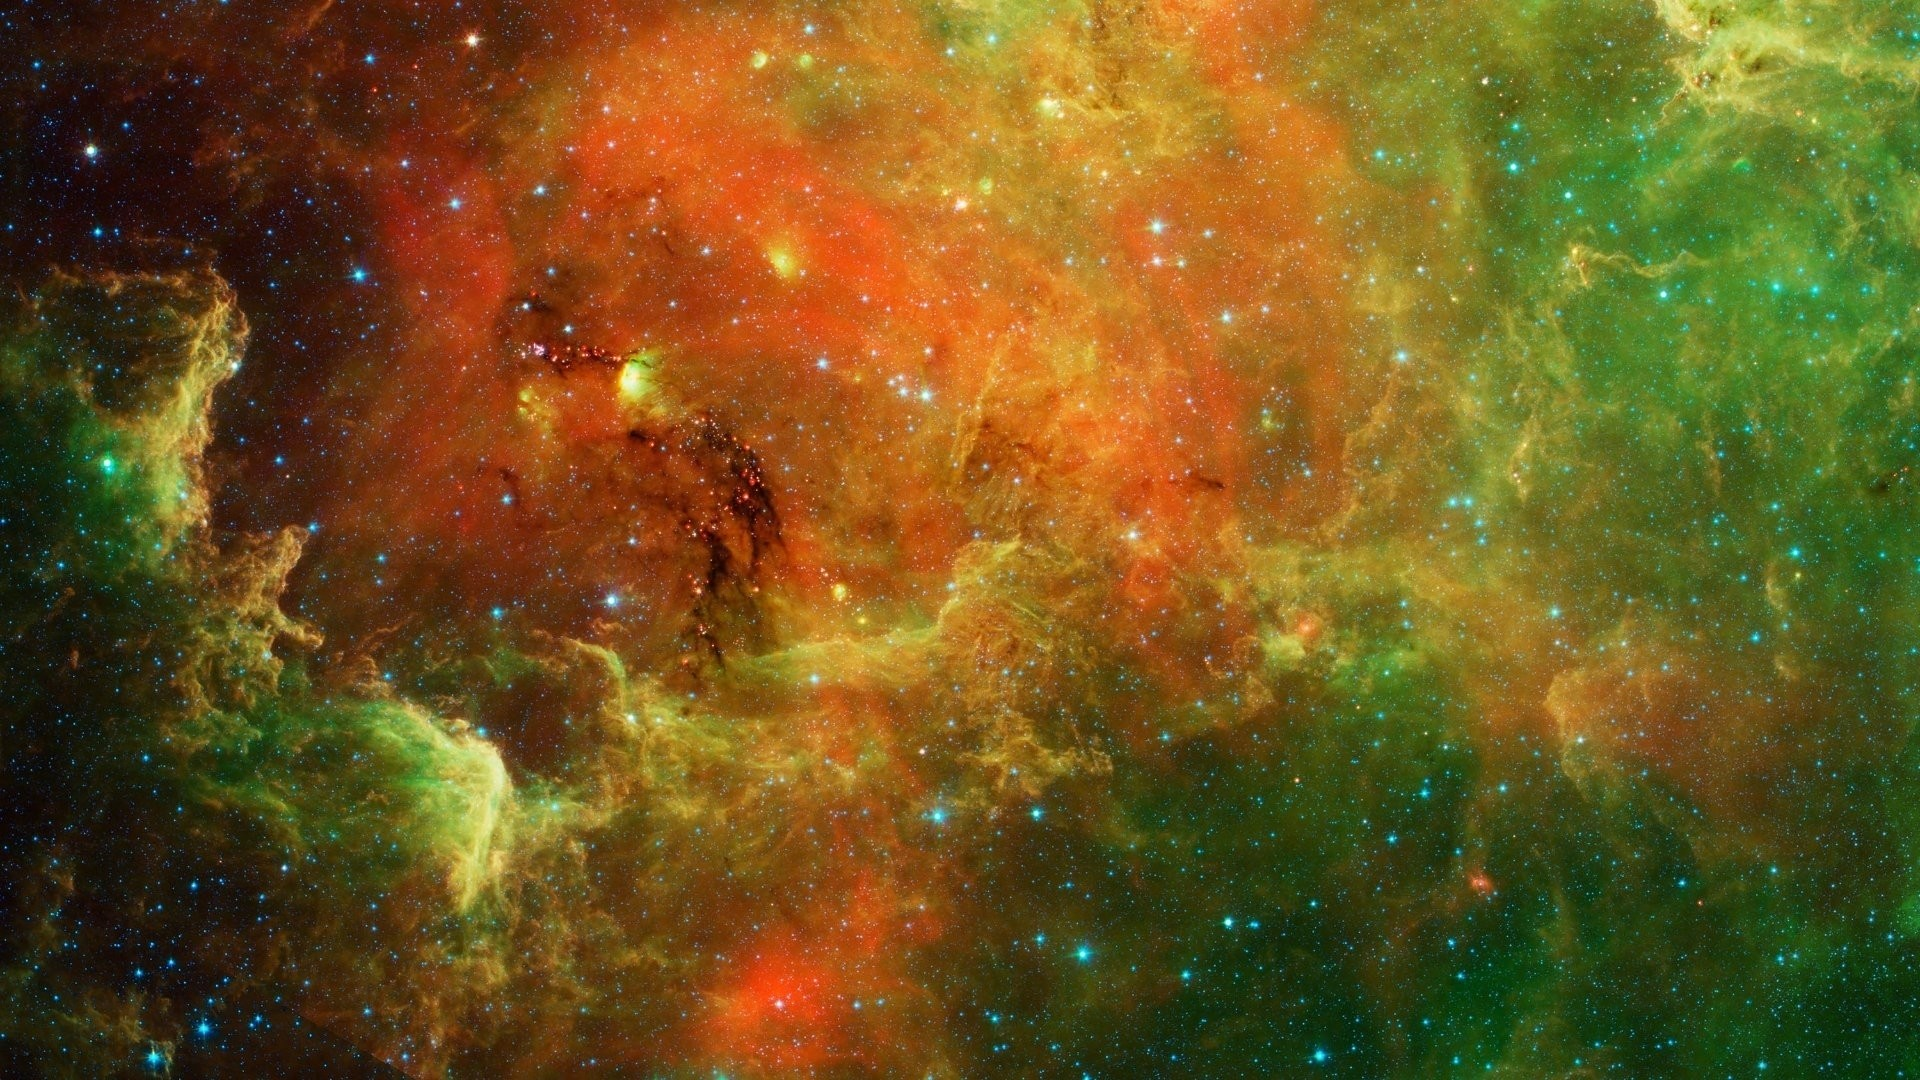 Outer space stars galaxies nasa hubble nebula wallpaper | | 85389  | WallpaperUP